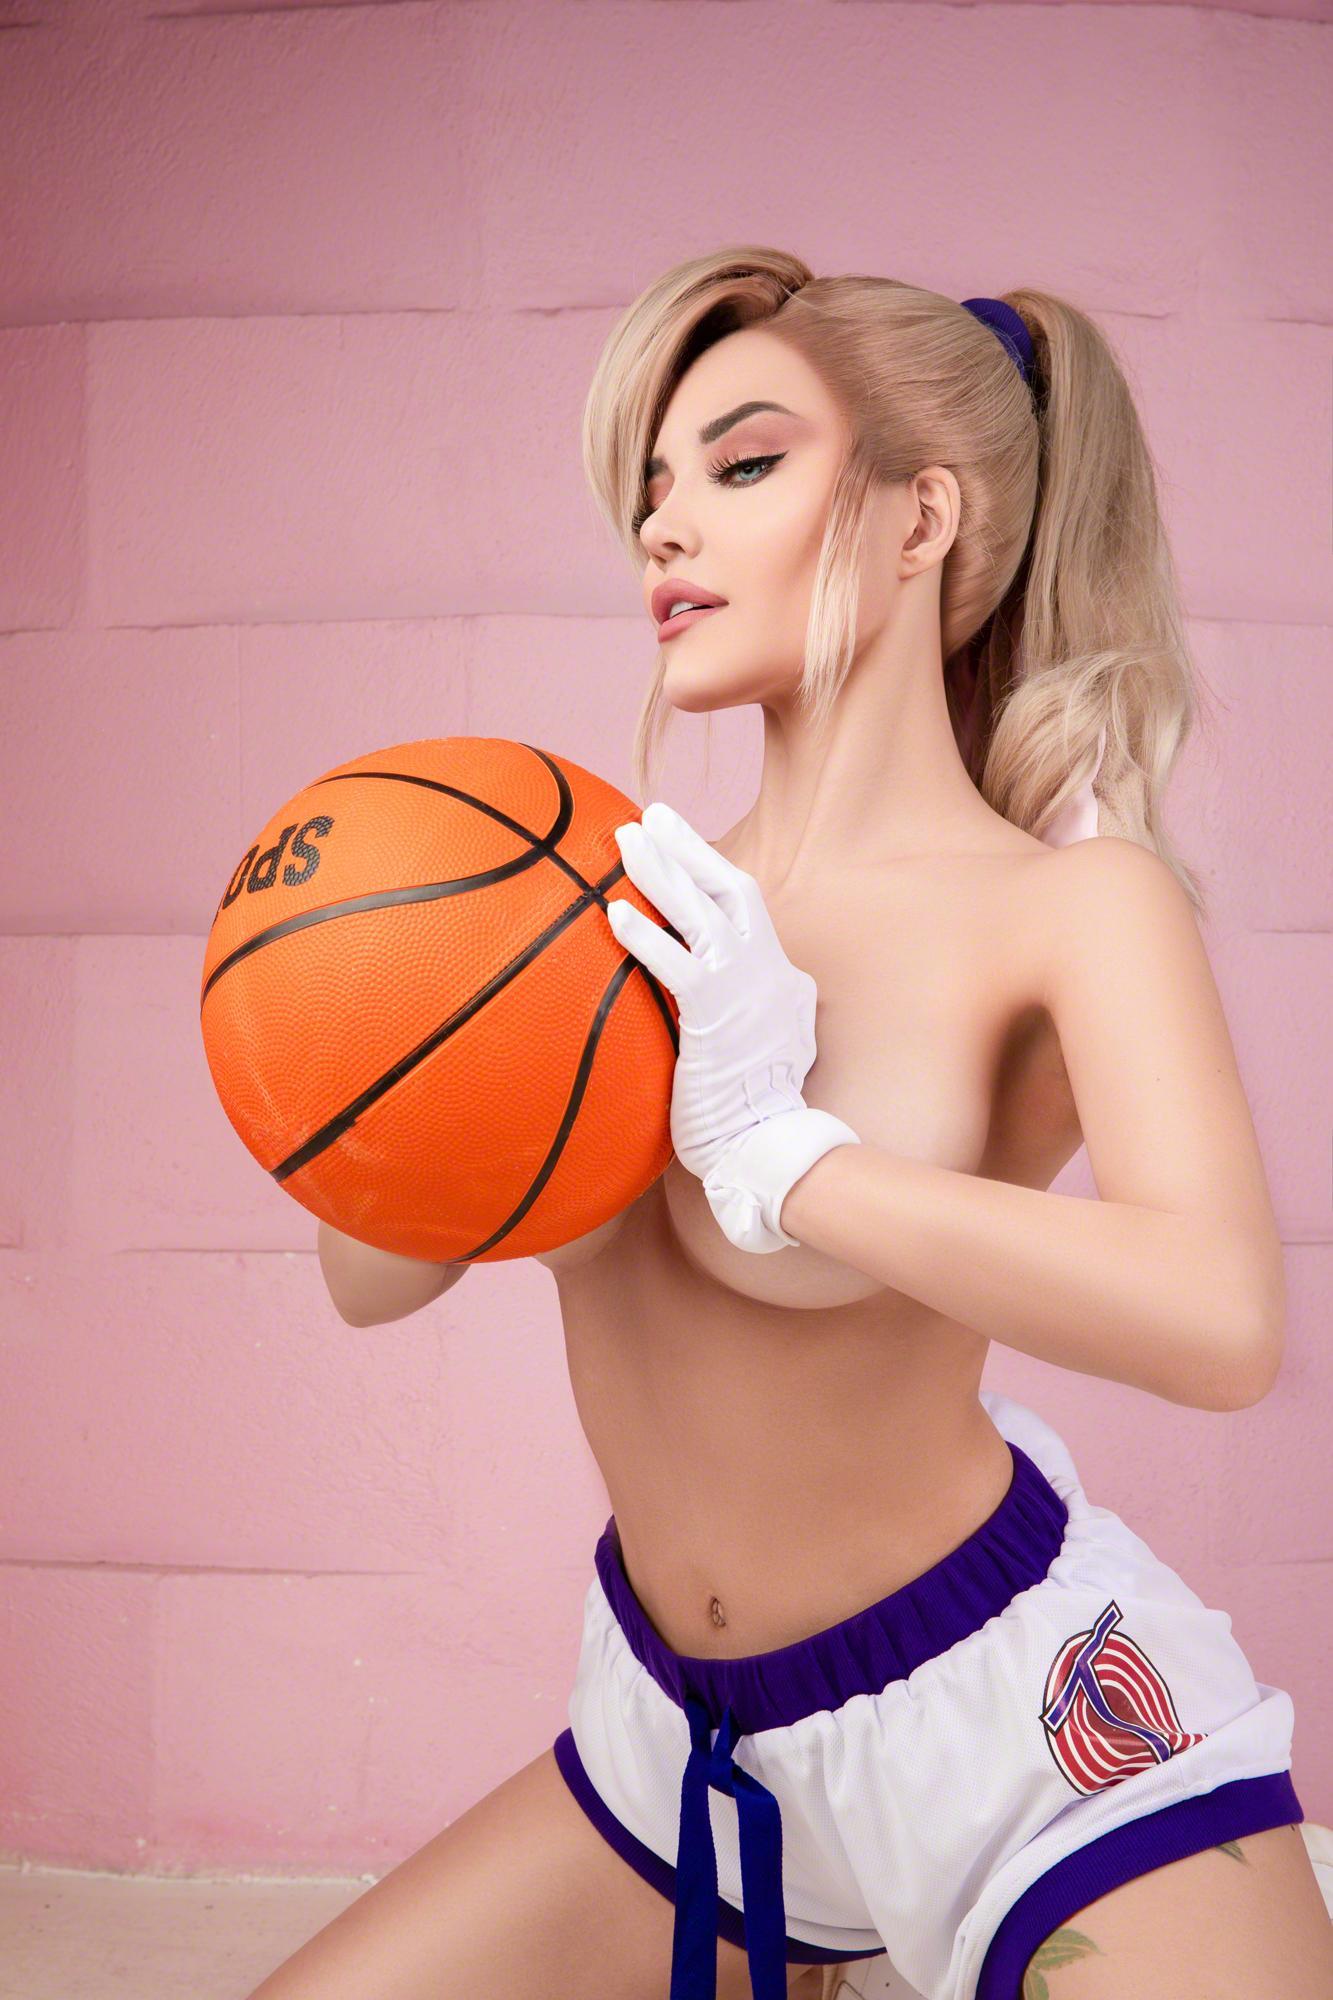 Kalinka Fox Nude Lola Bunny Space Jam Cosplay Leaked Uevnap